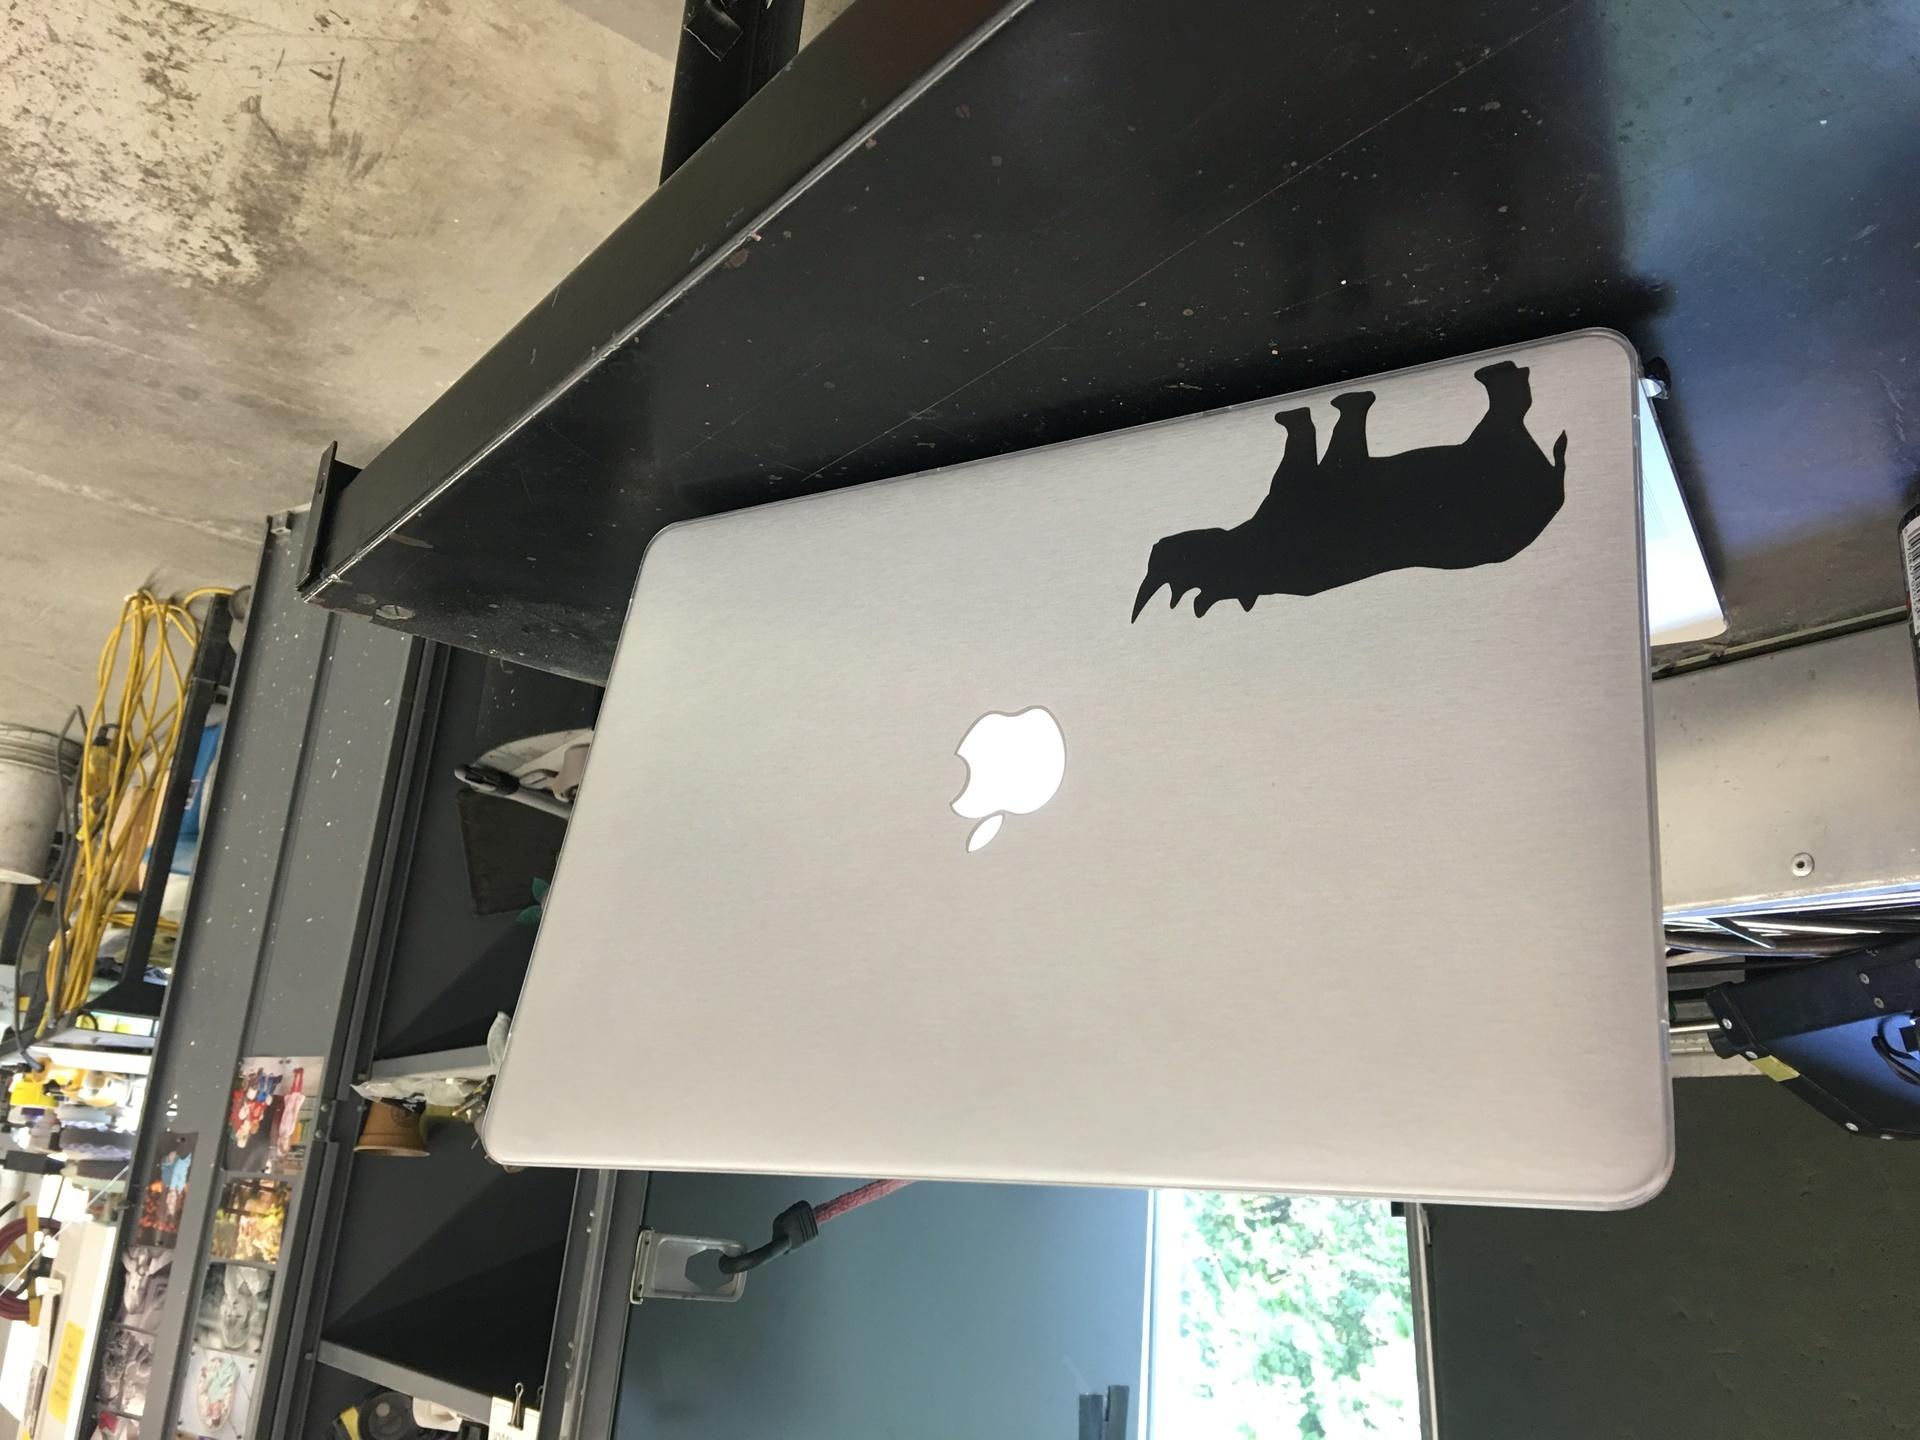 Matt's photograph of their Rhinoceros Body Sticker